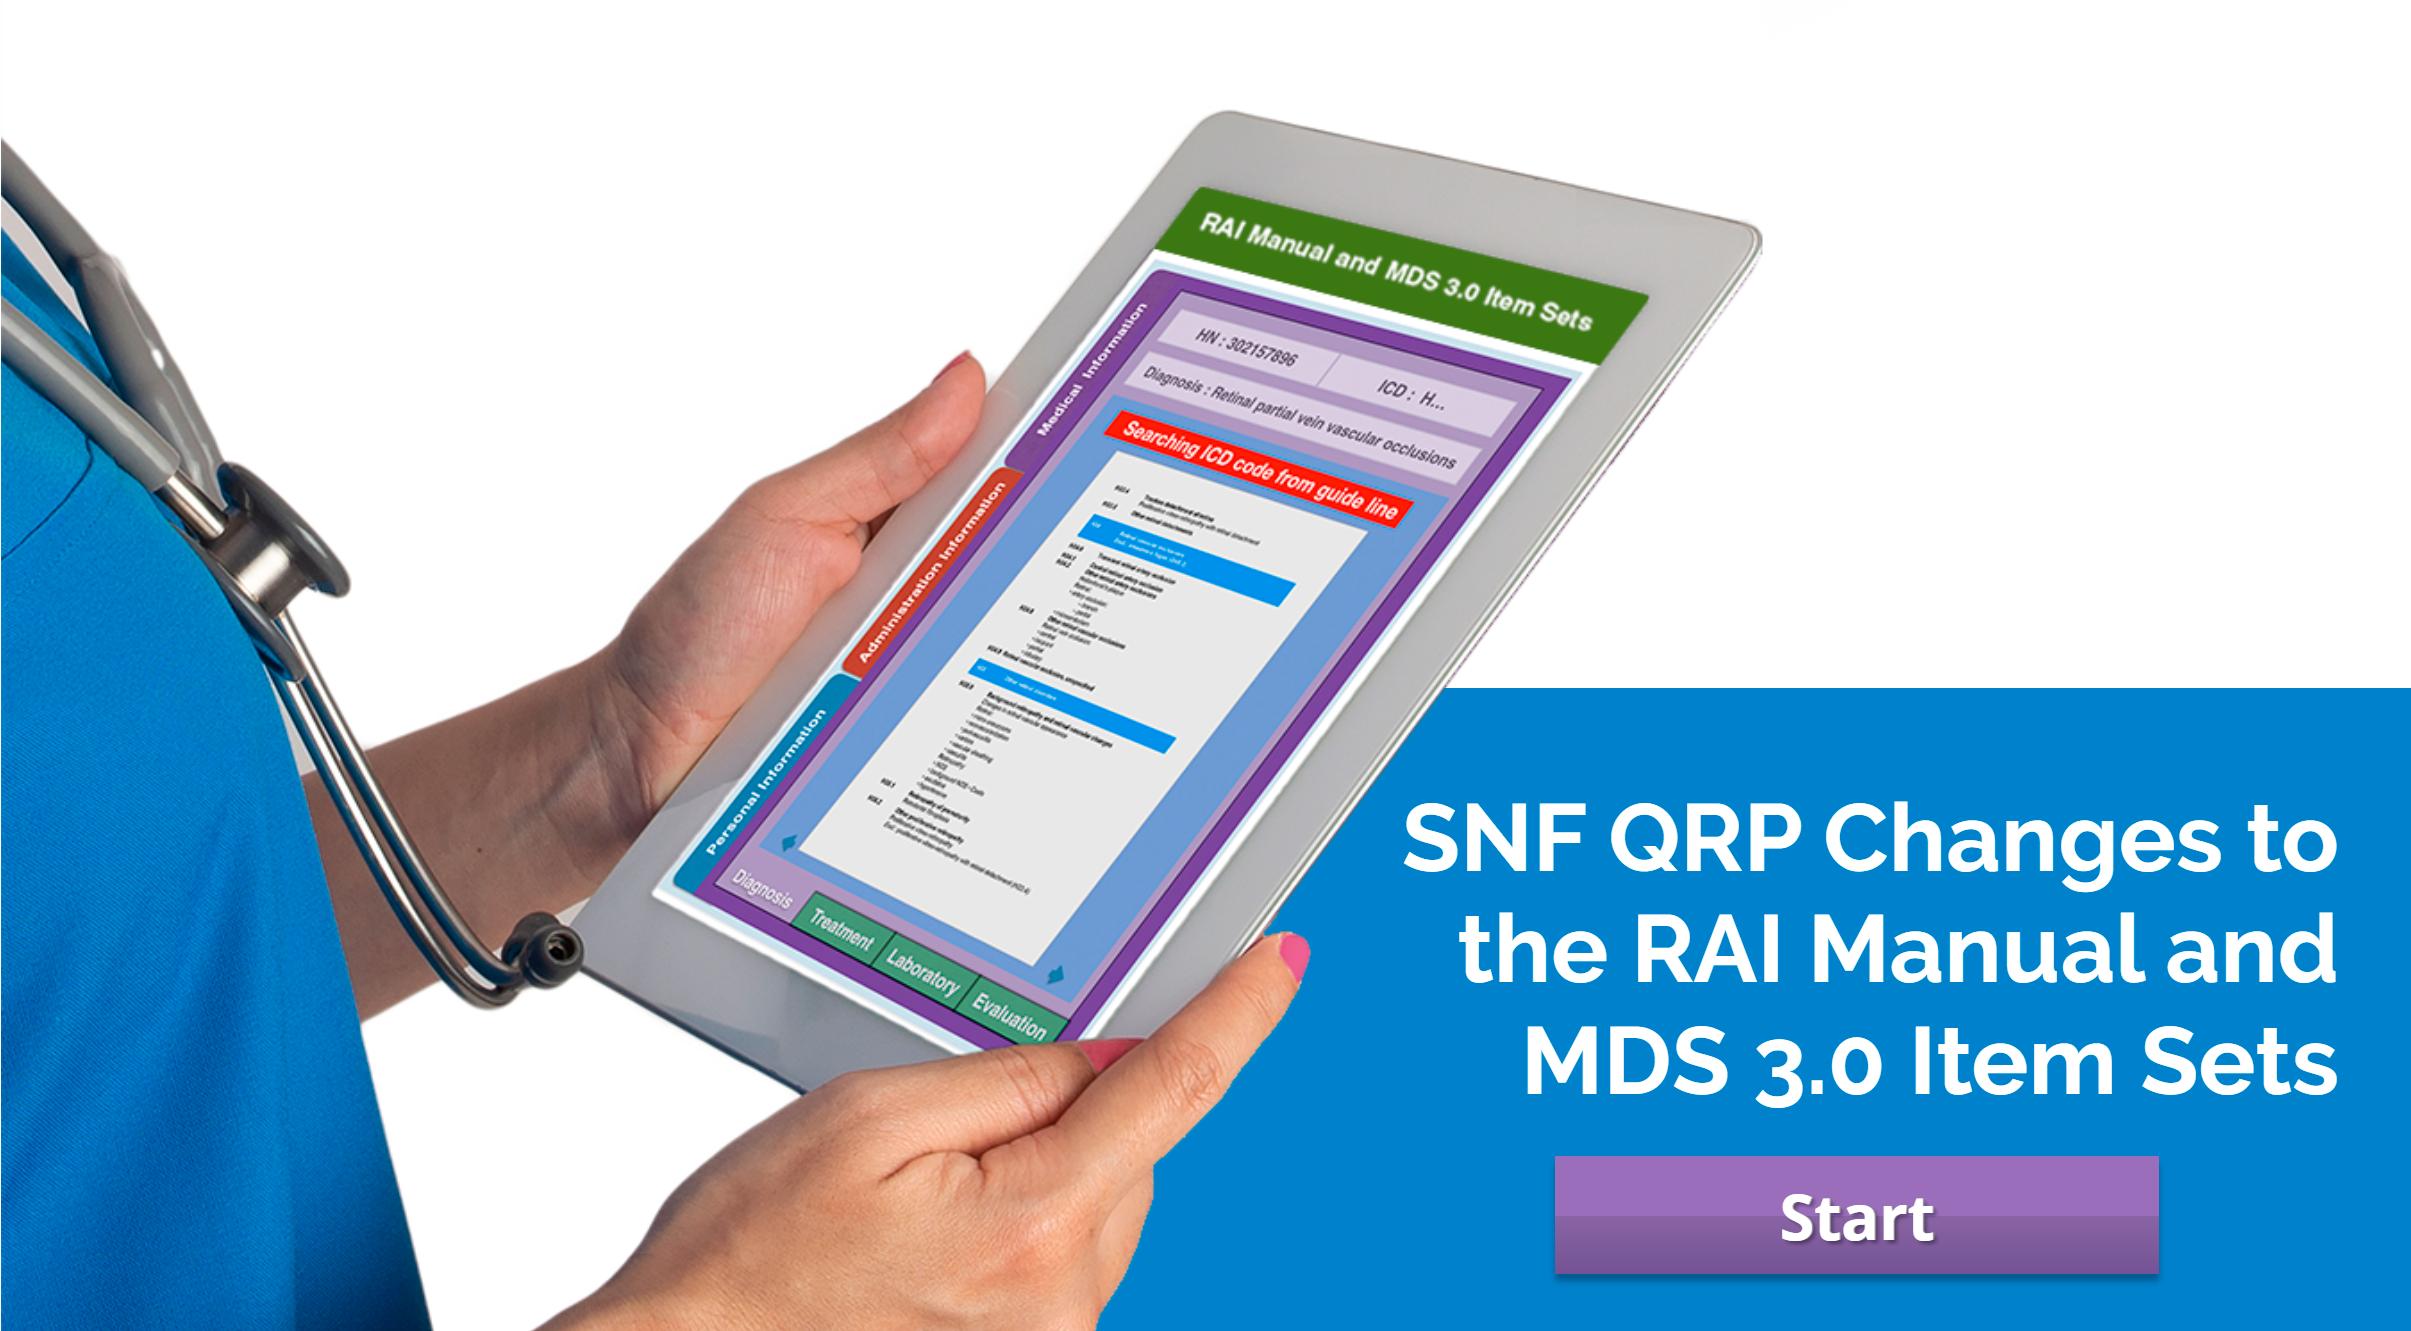 CMS SNF QRP: RAI Manual and MDS 3.0 Item Sets